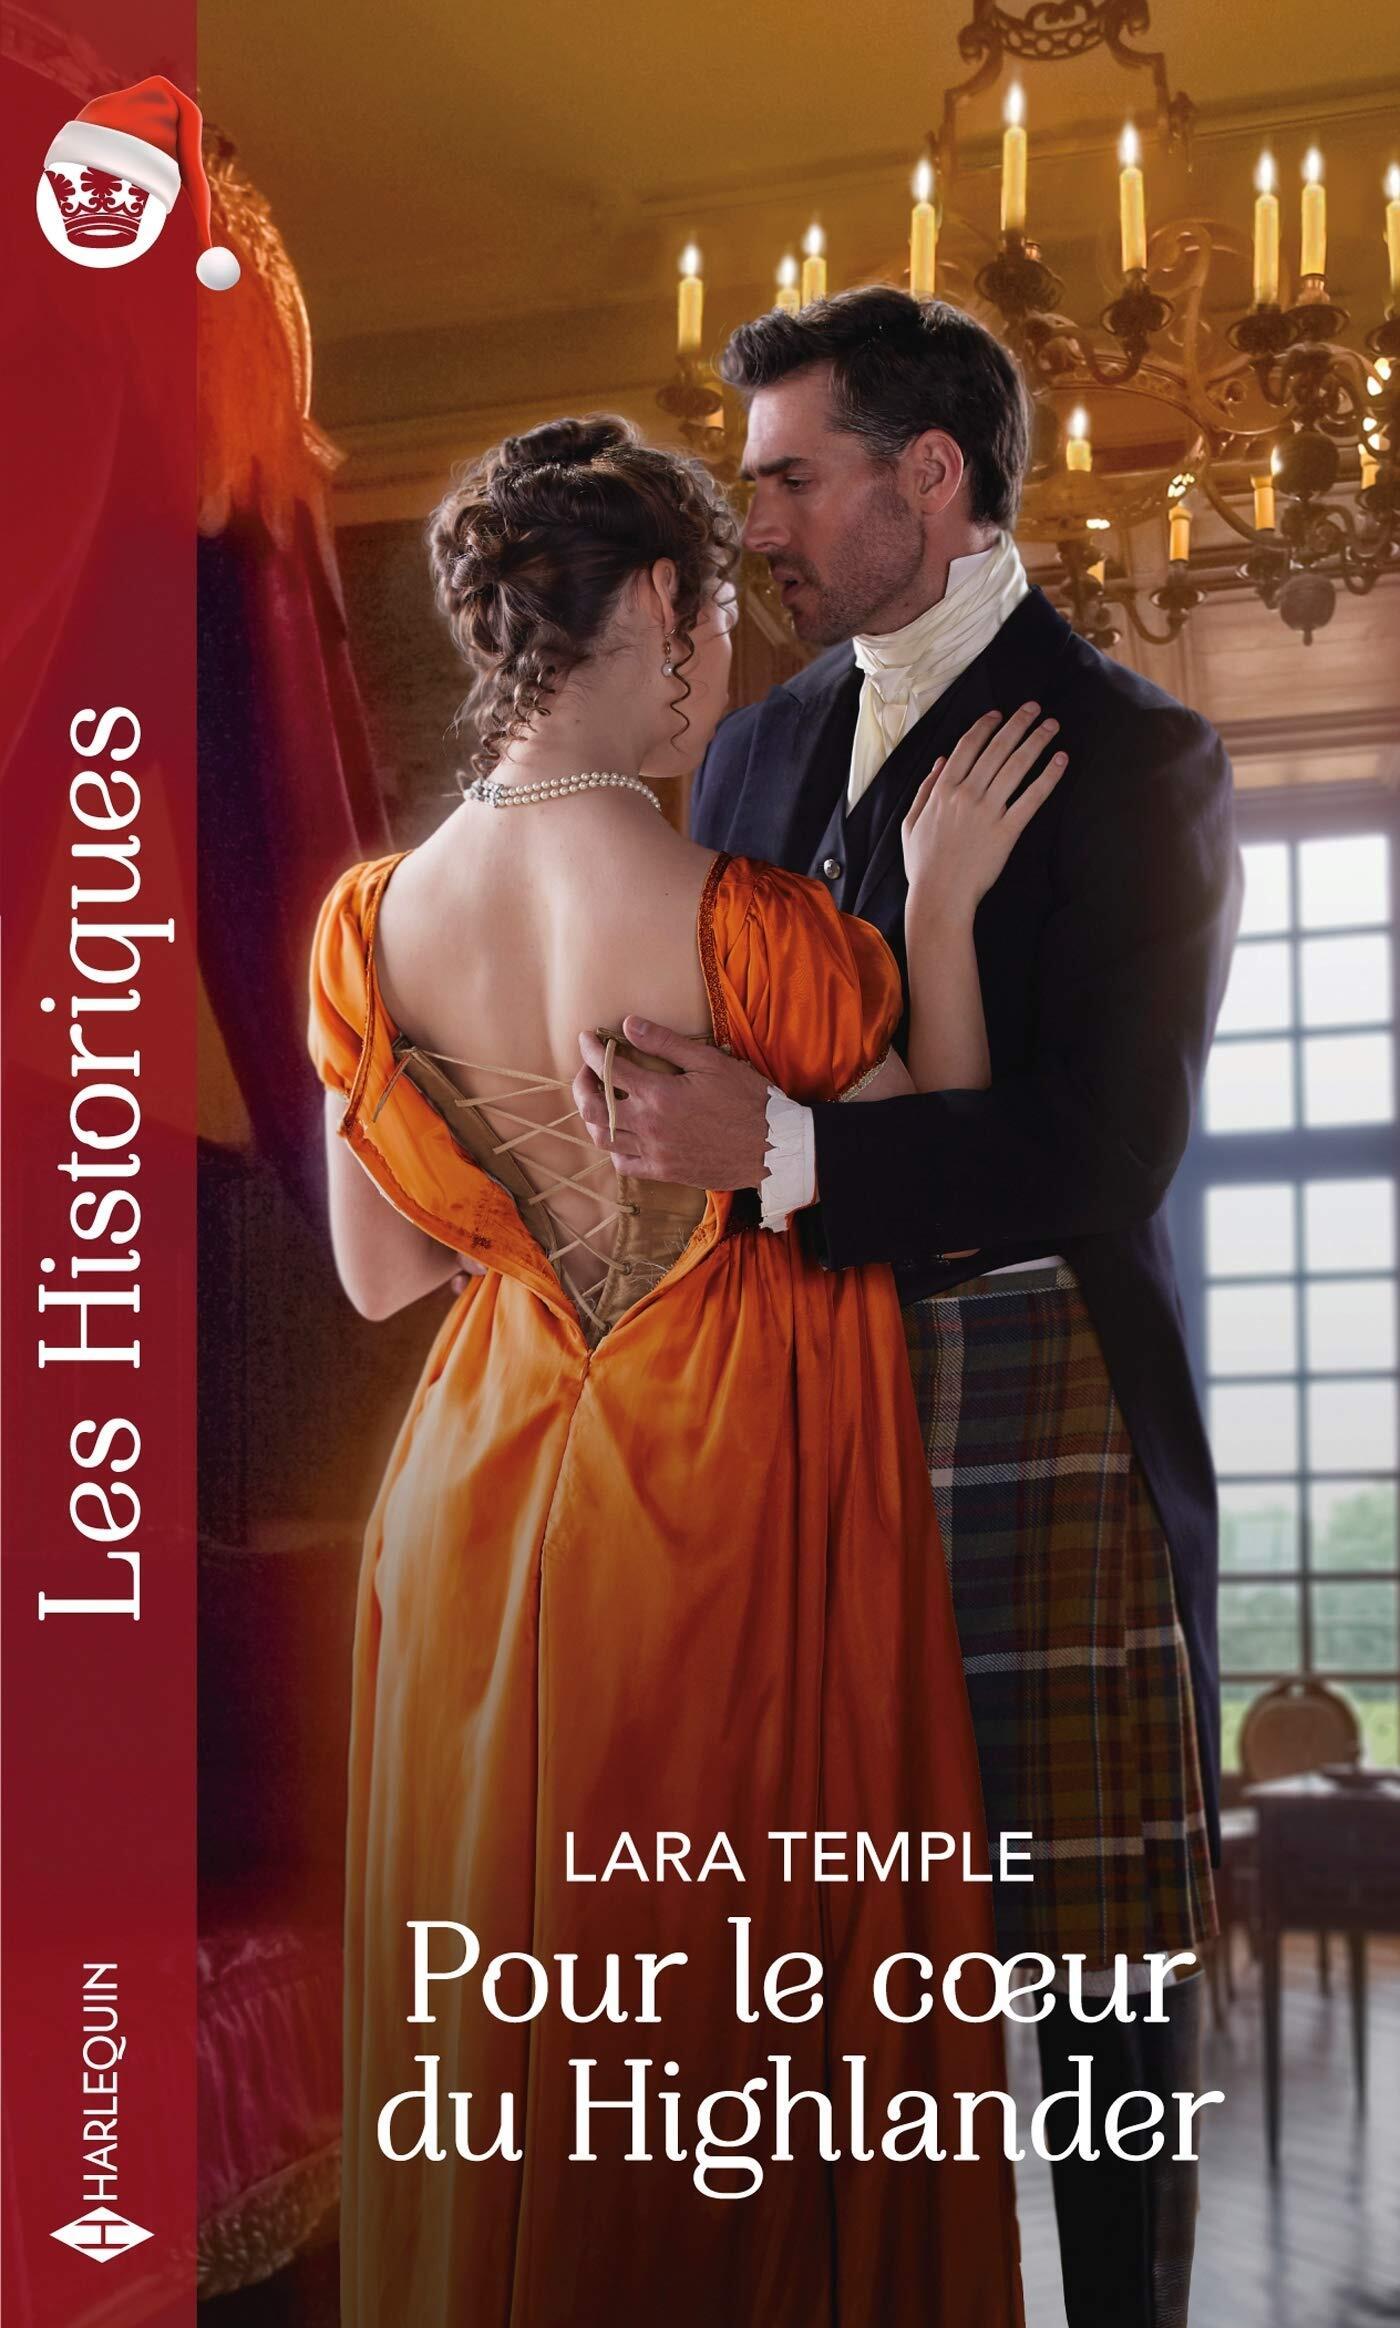 cdn1.booknode.com/book_cover/1400/full/pour-le-coeur-du-highlander-1400123.jpg